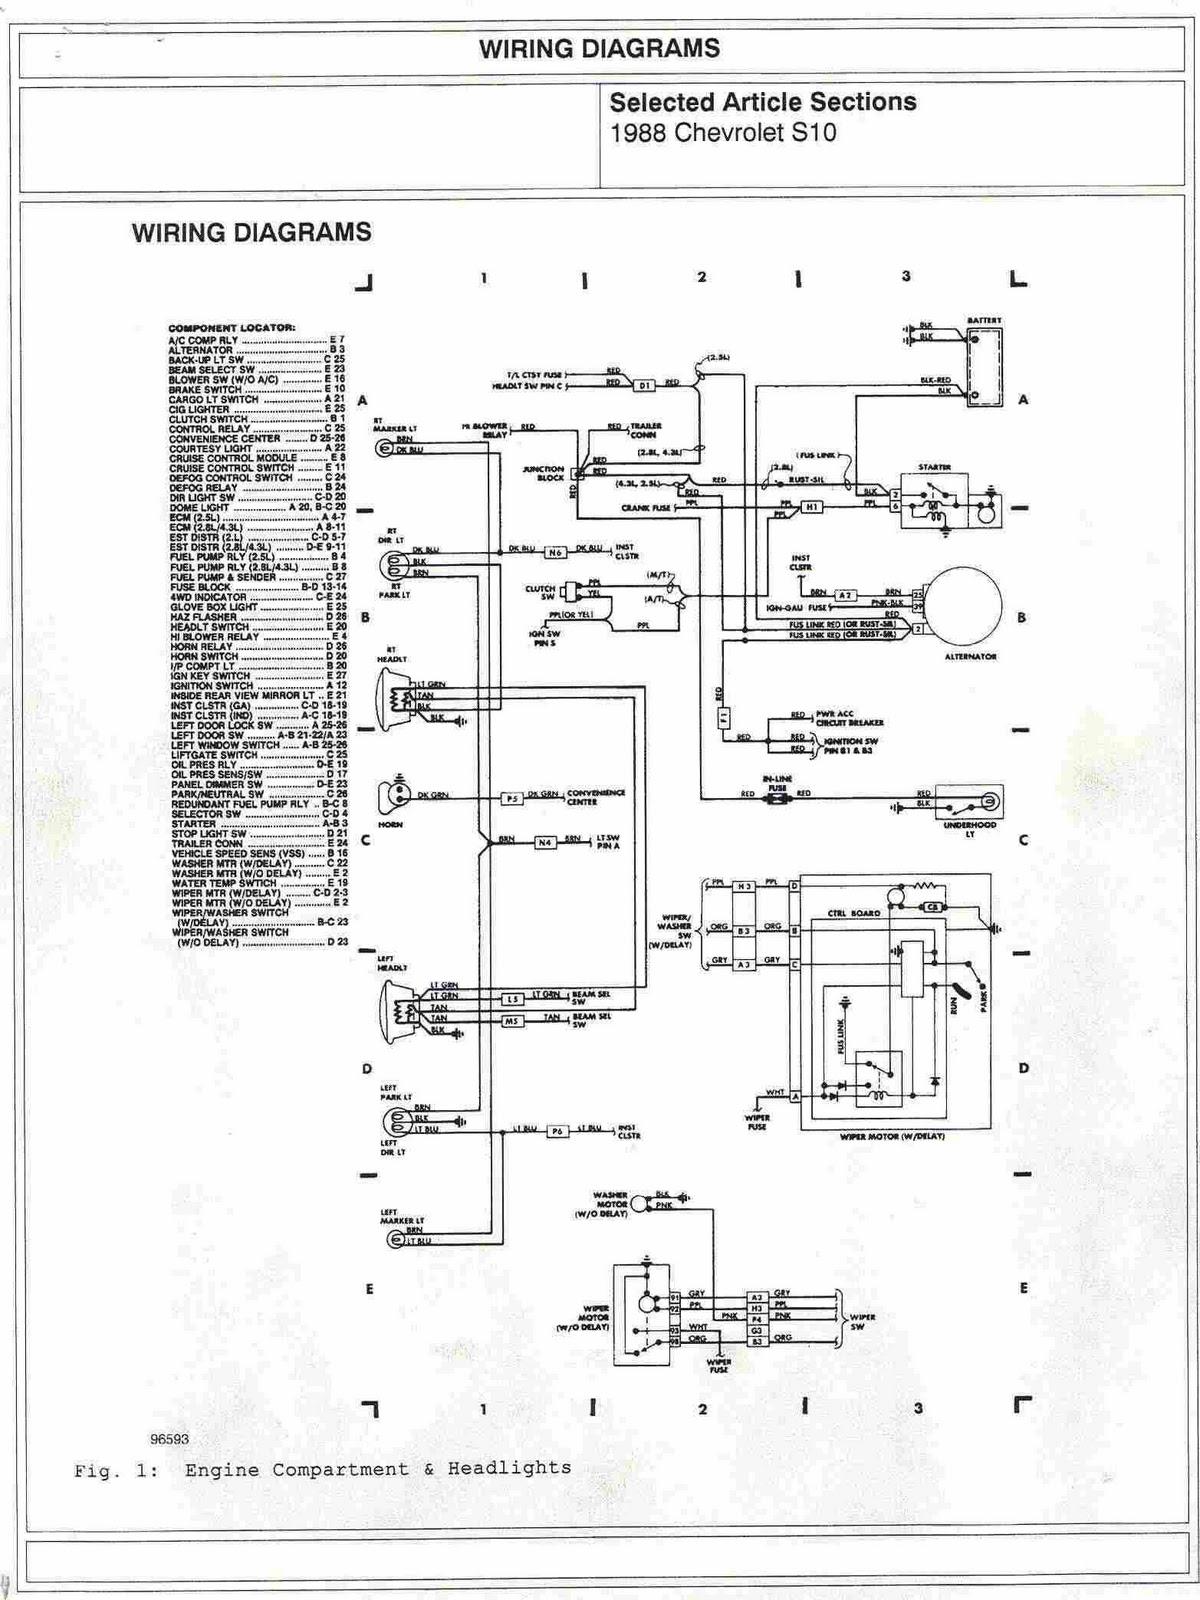 chevrolet s10 dome light wiring diagram wiring diagram schematic